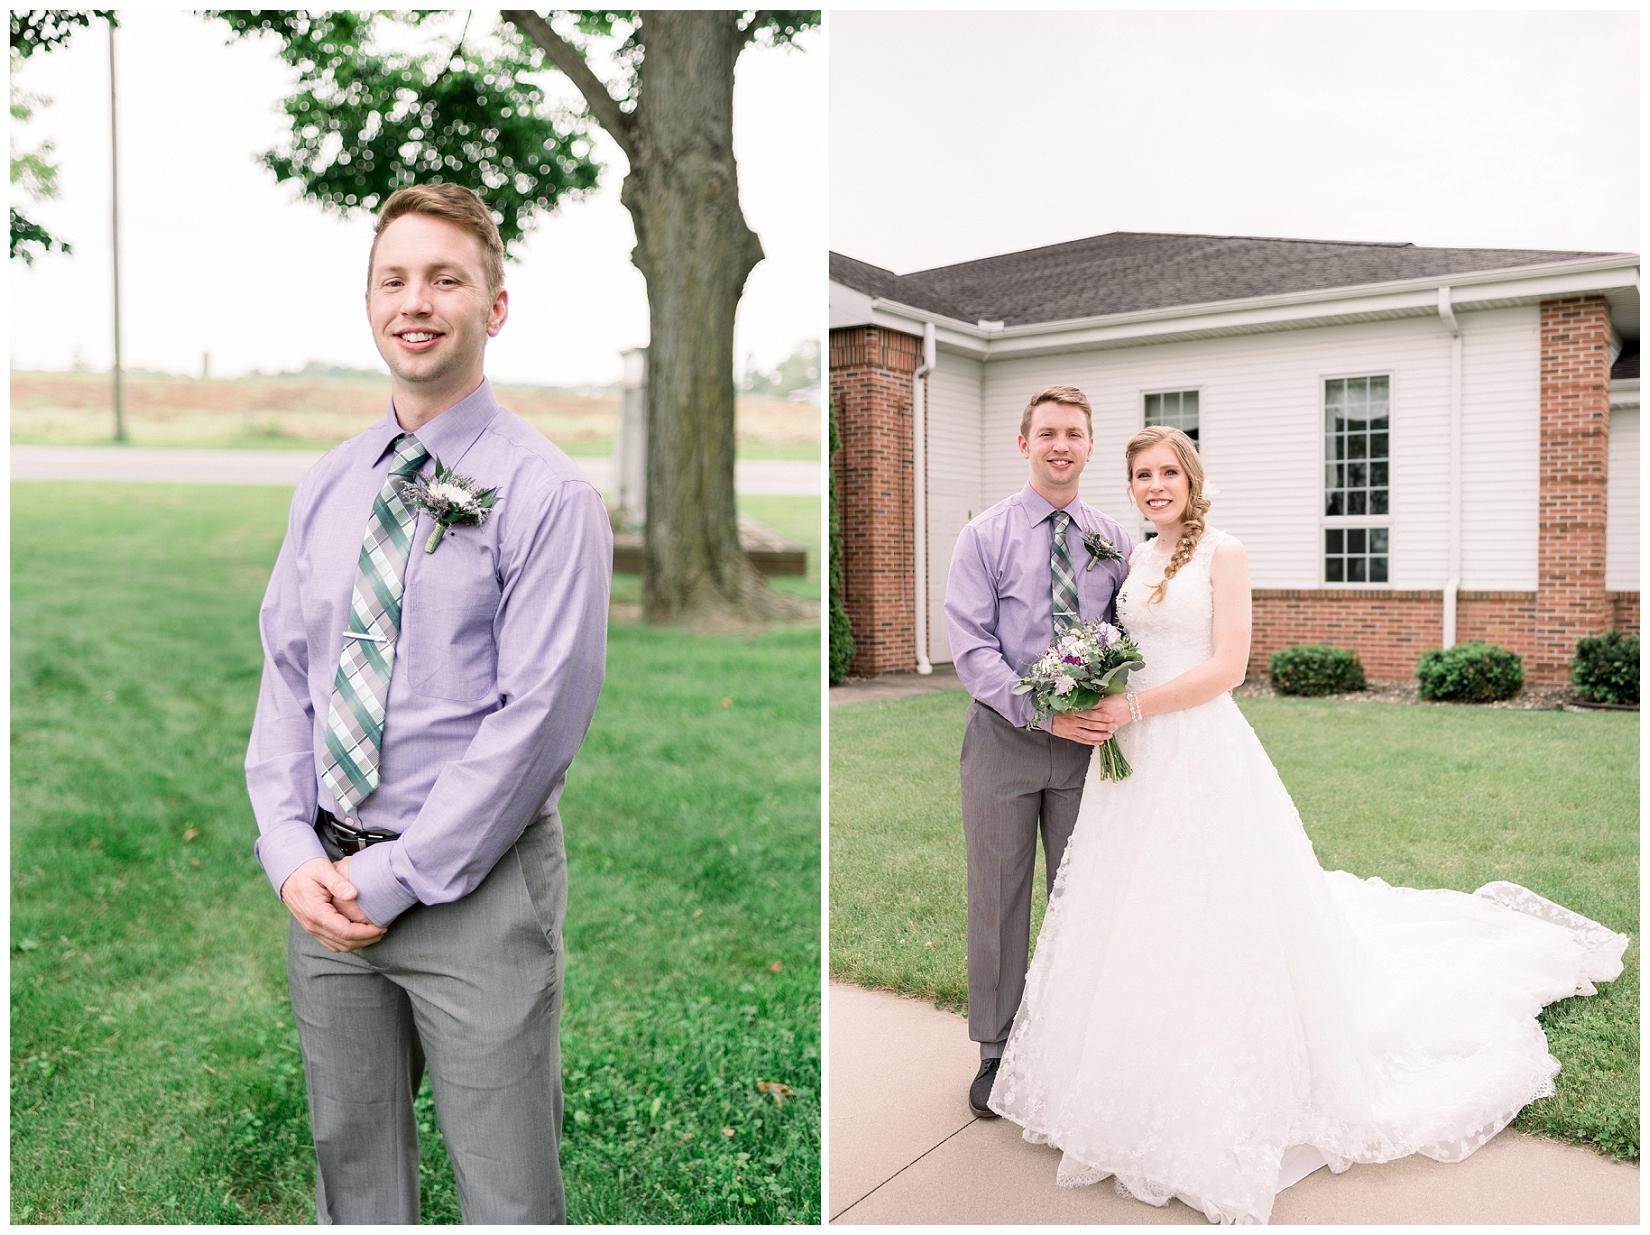 cat-alkire-wedding-photographer-indiana-chicago-indianapolis-fort-wayne_1306.jpg